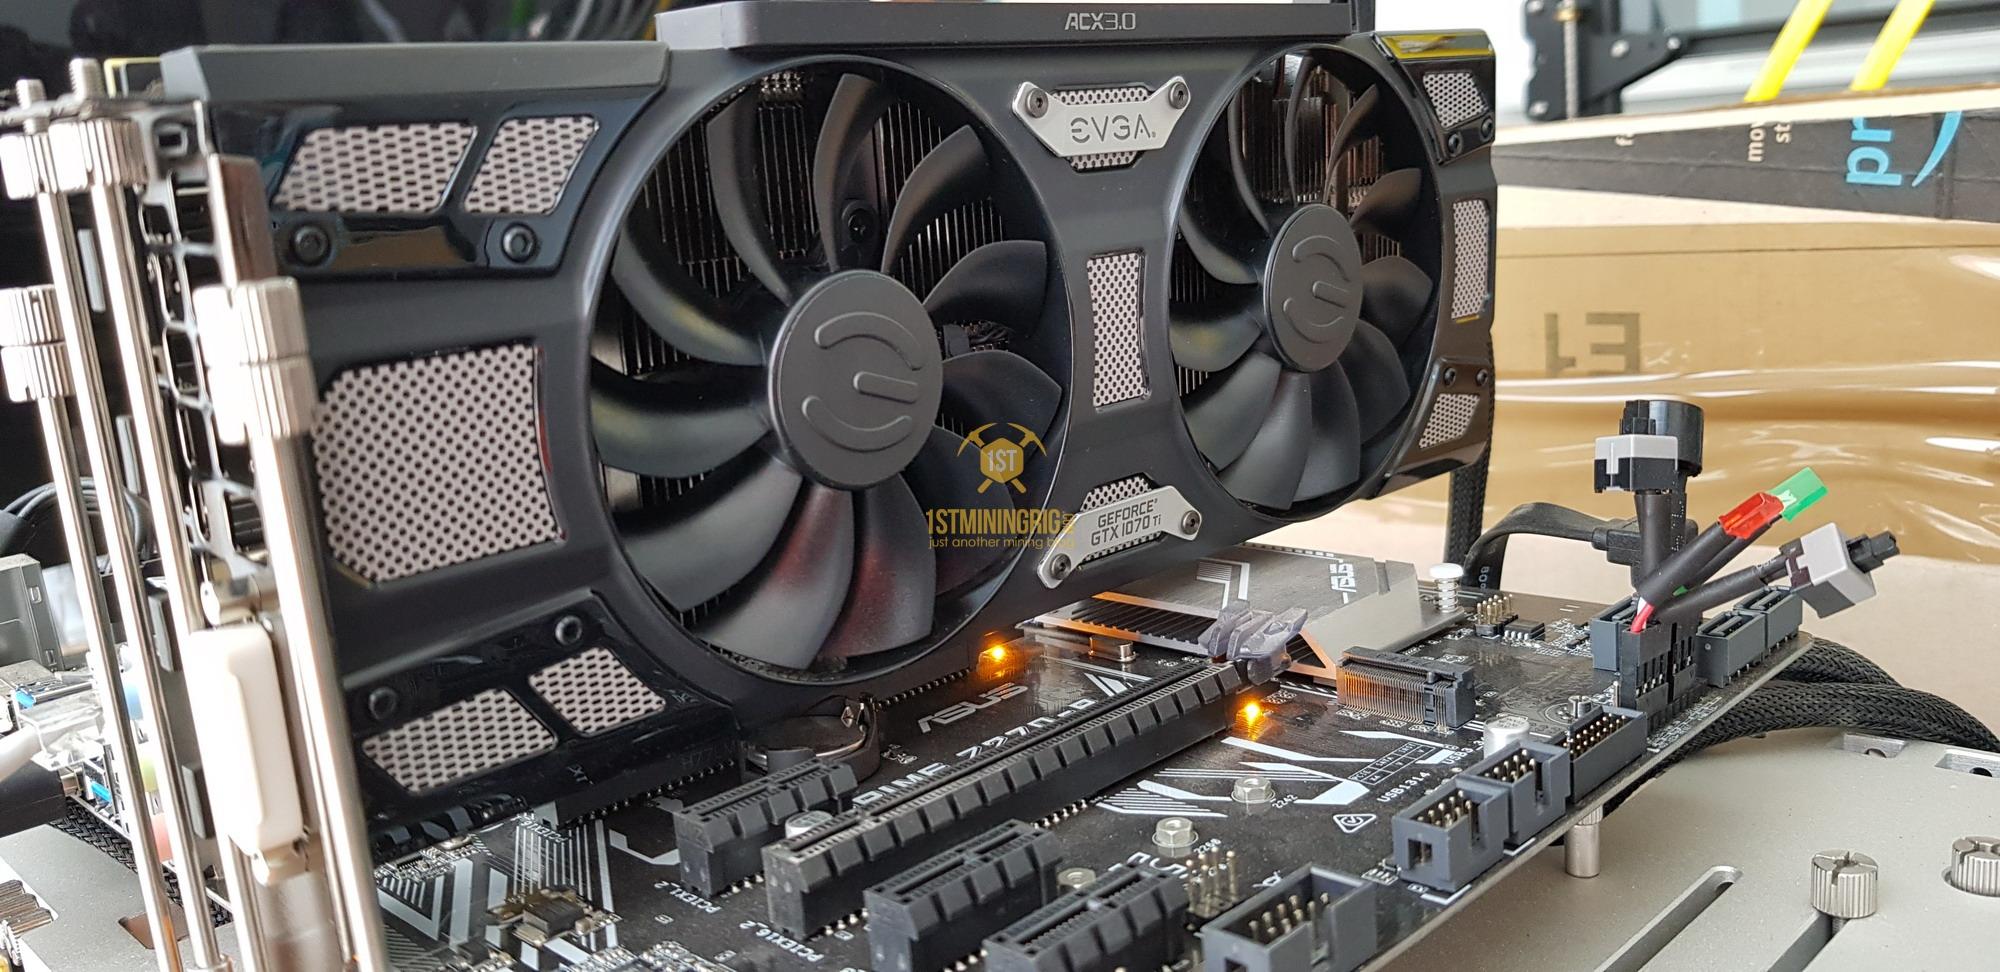 EVGA GTX 1070 Ti SC Gaming Black Edition - Mining Performance and